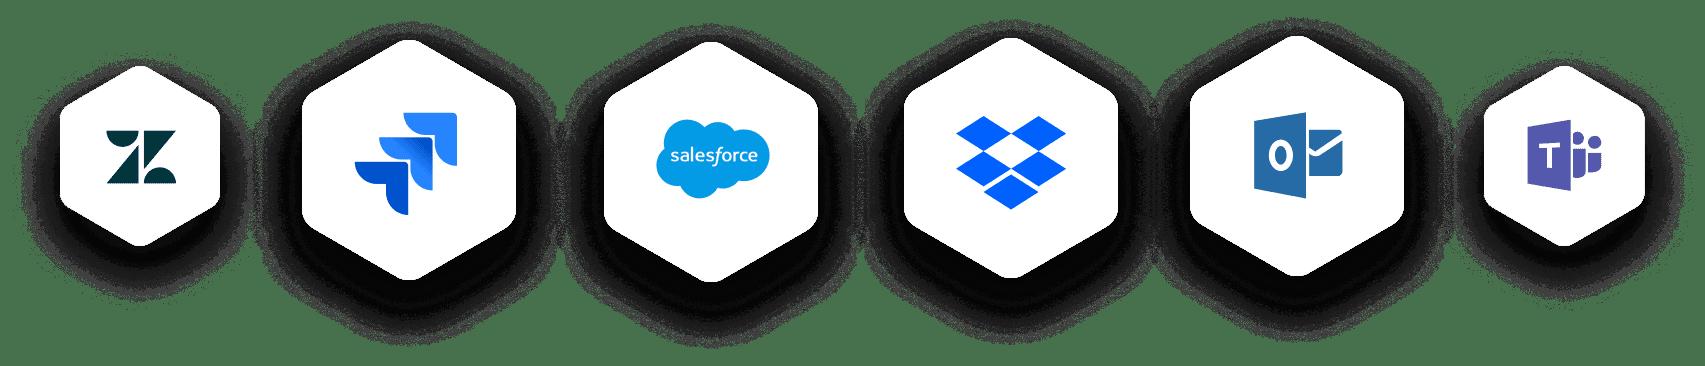 logos of tools like zendesk and salesforce